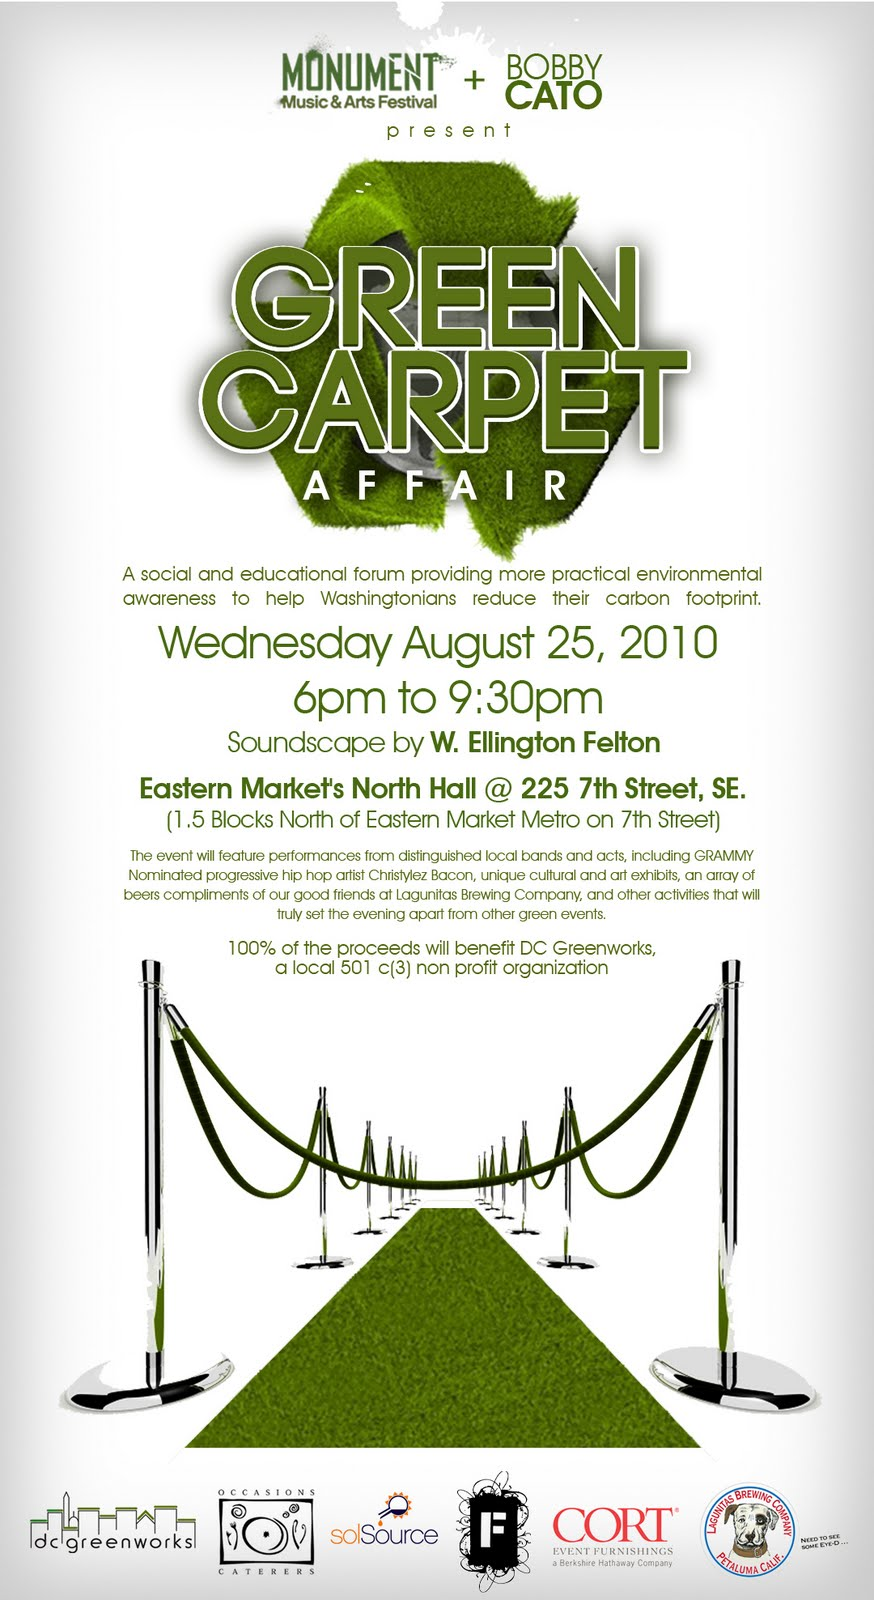 http://4.bp.blogspot.com/_pwb5wFhUZDk/TG2OEMUsHRI/AAAAAAAAAlc/hvPOay883o8/s1600/green-carpet-1.jpg